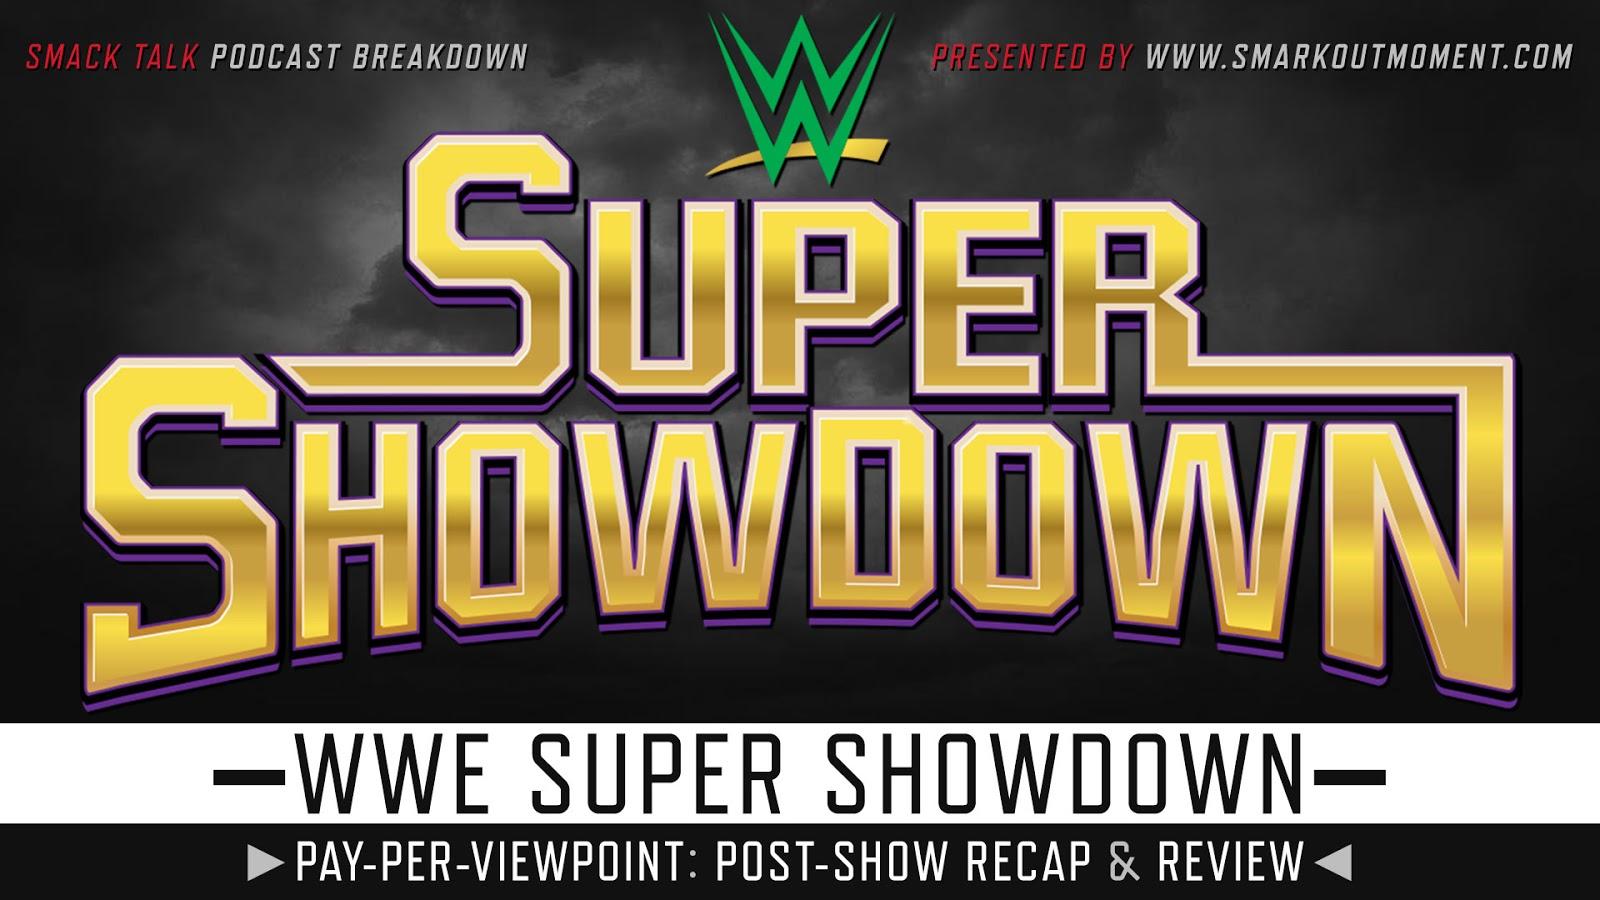 WWE Super ShowDown 2019 Recap and Review Podcast